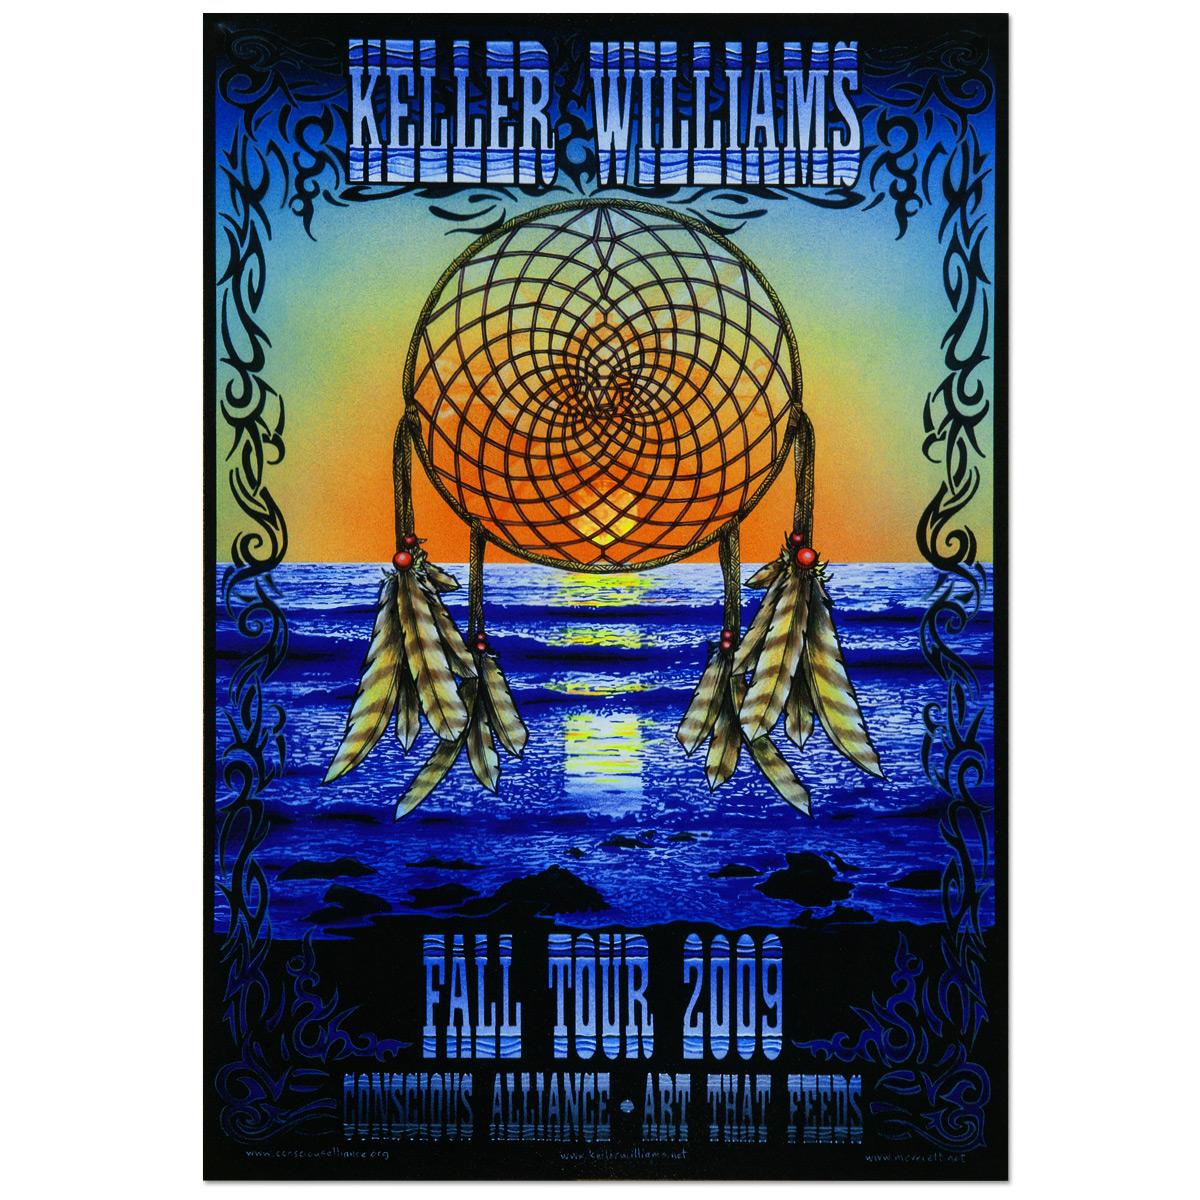 Keller Williams Fall Tour 2009 Poster